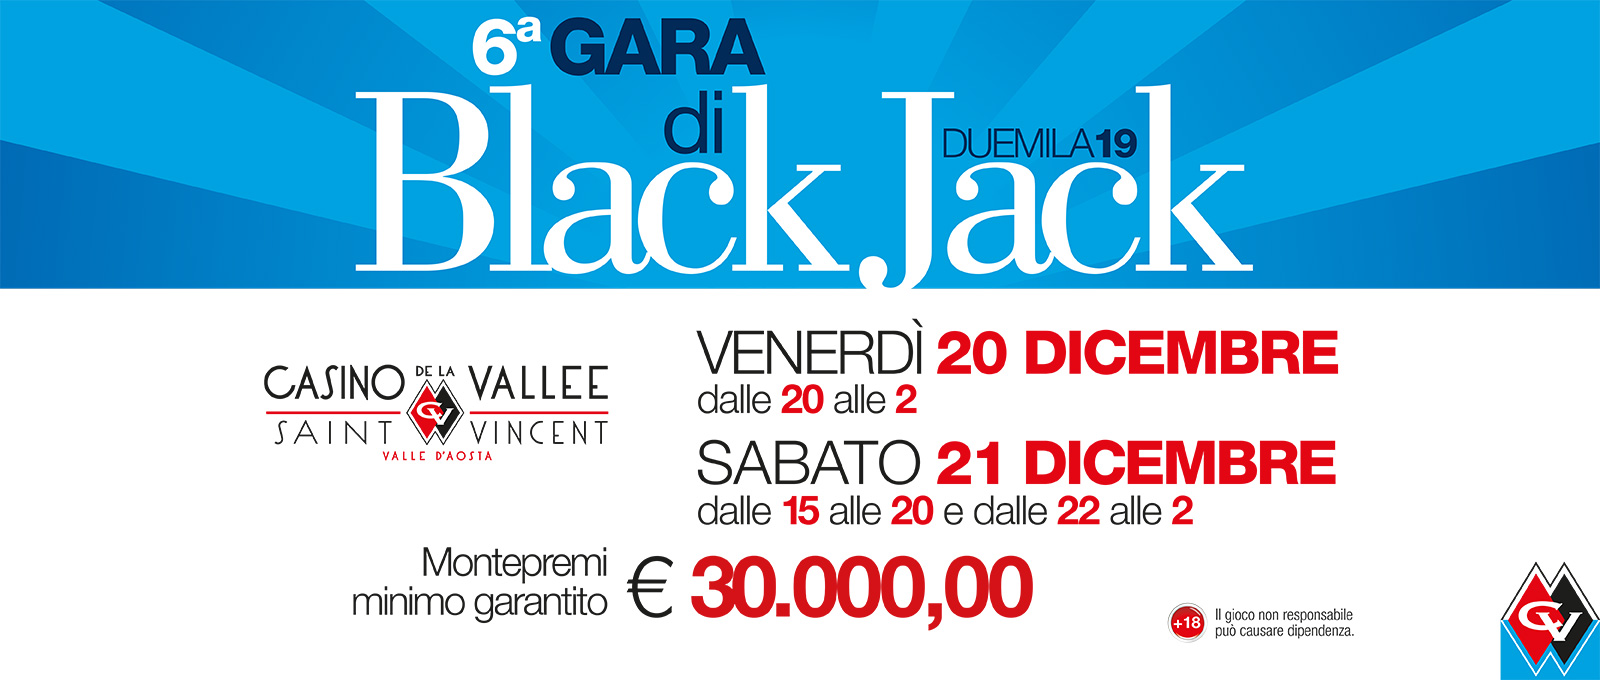 Sesta Gara di Black Jack